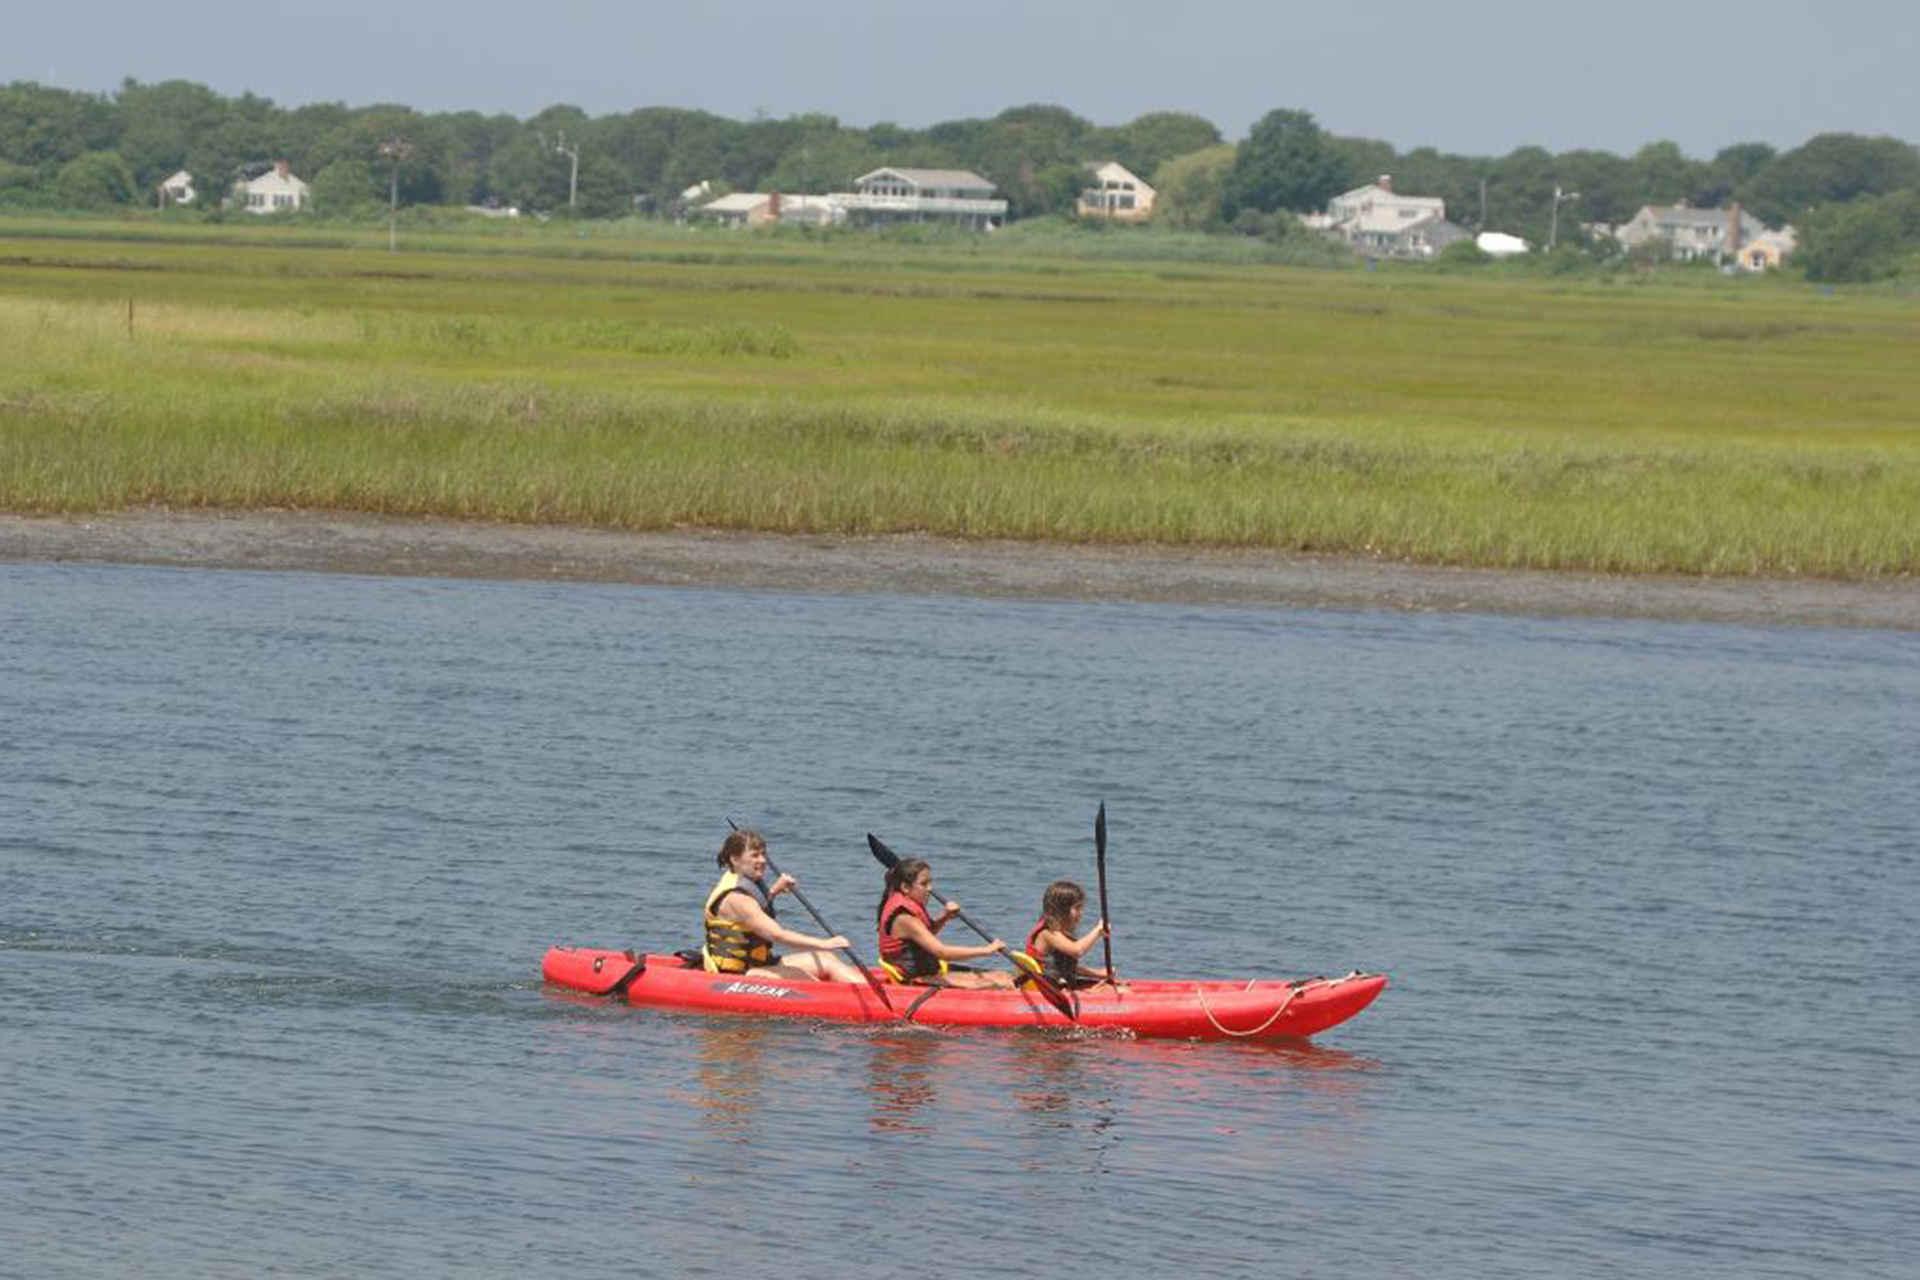 Red Jacket Beach Resort and Spa, 3 people on red kayak